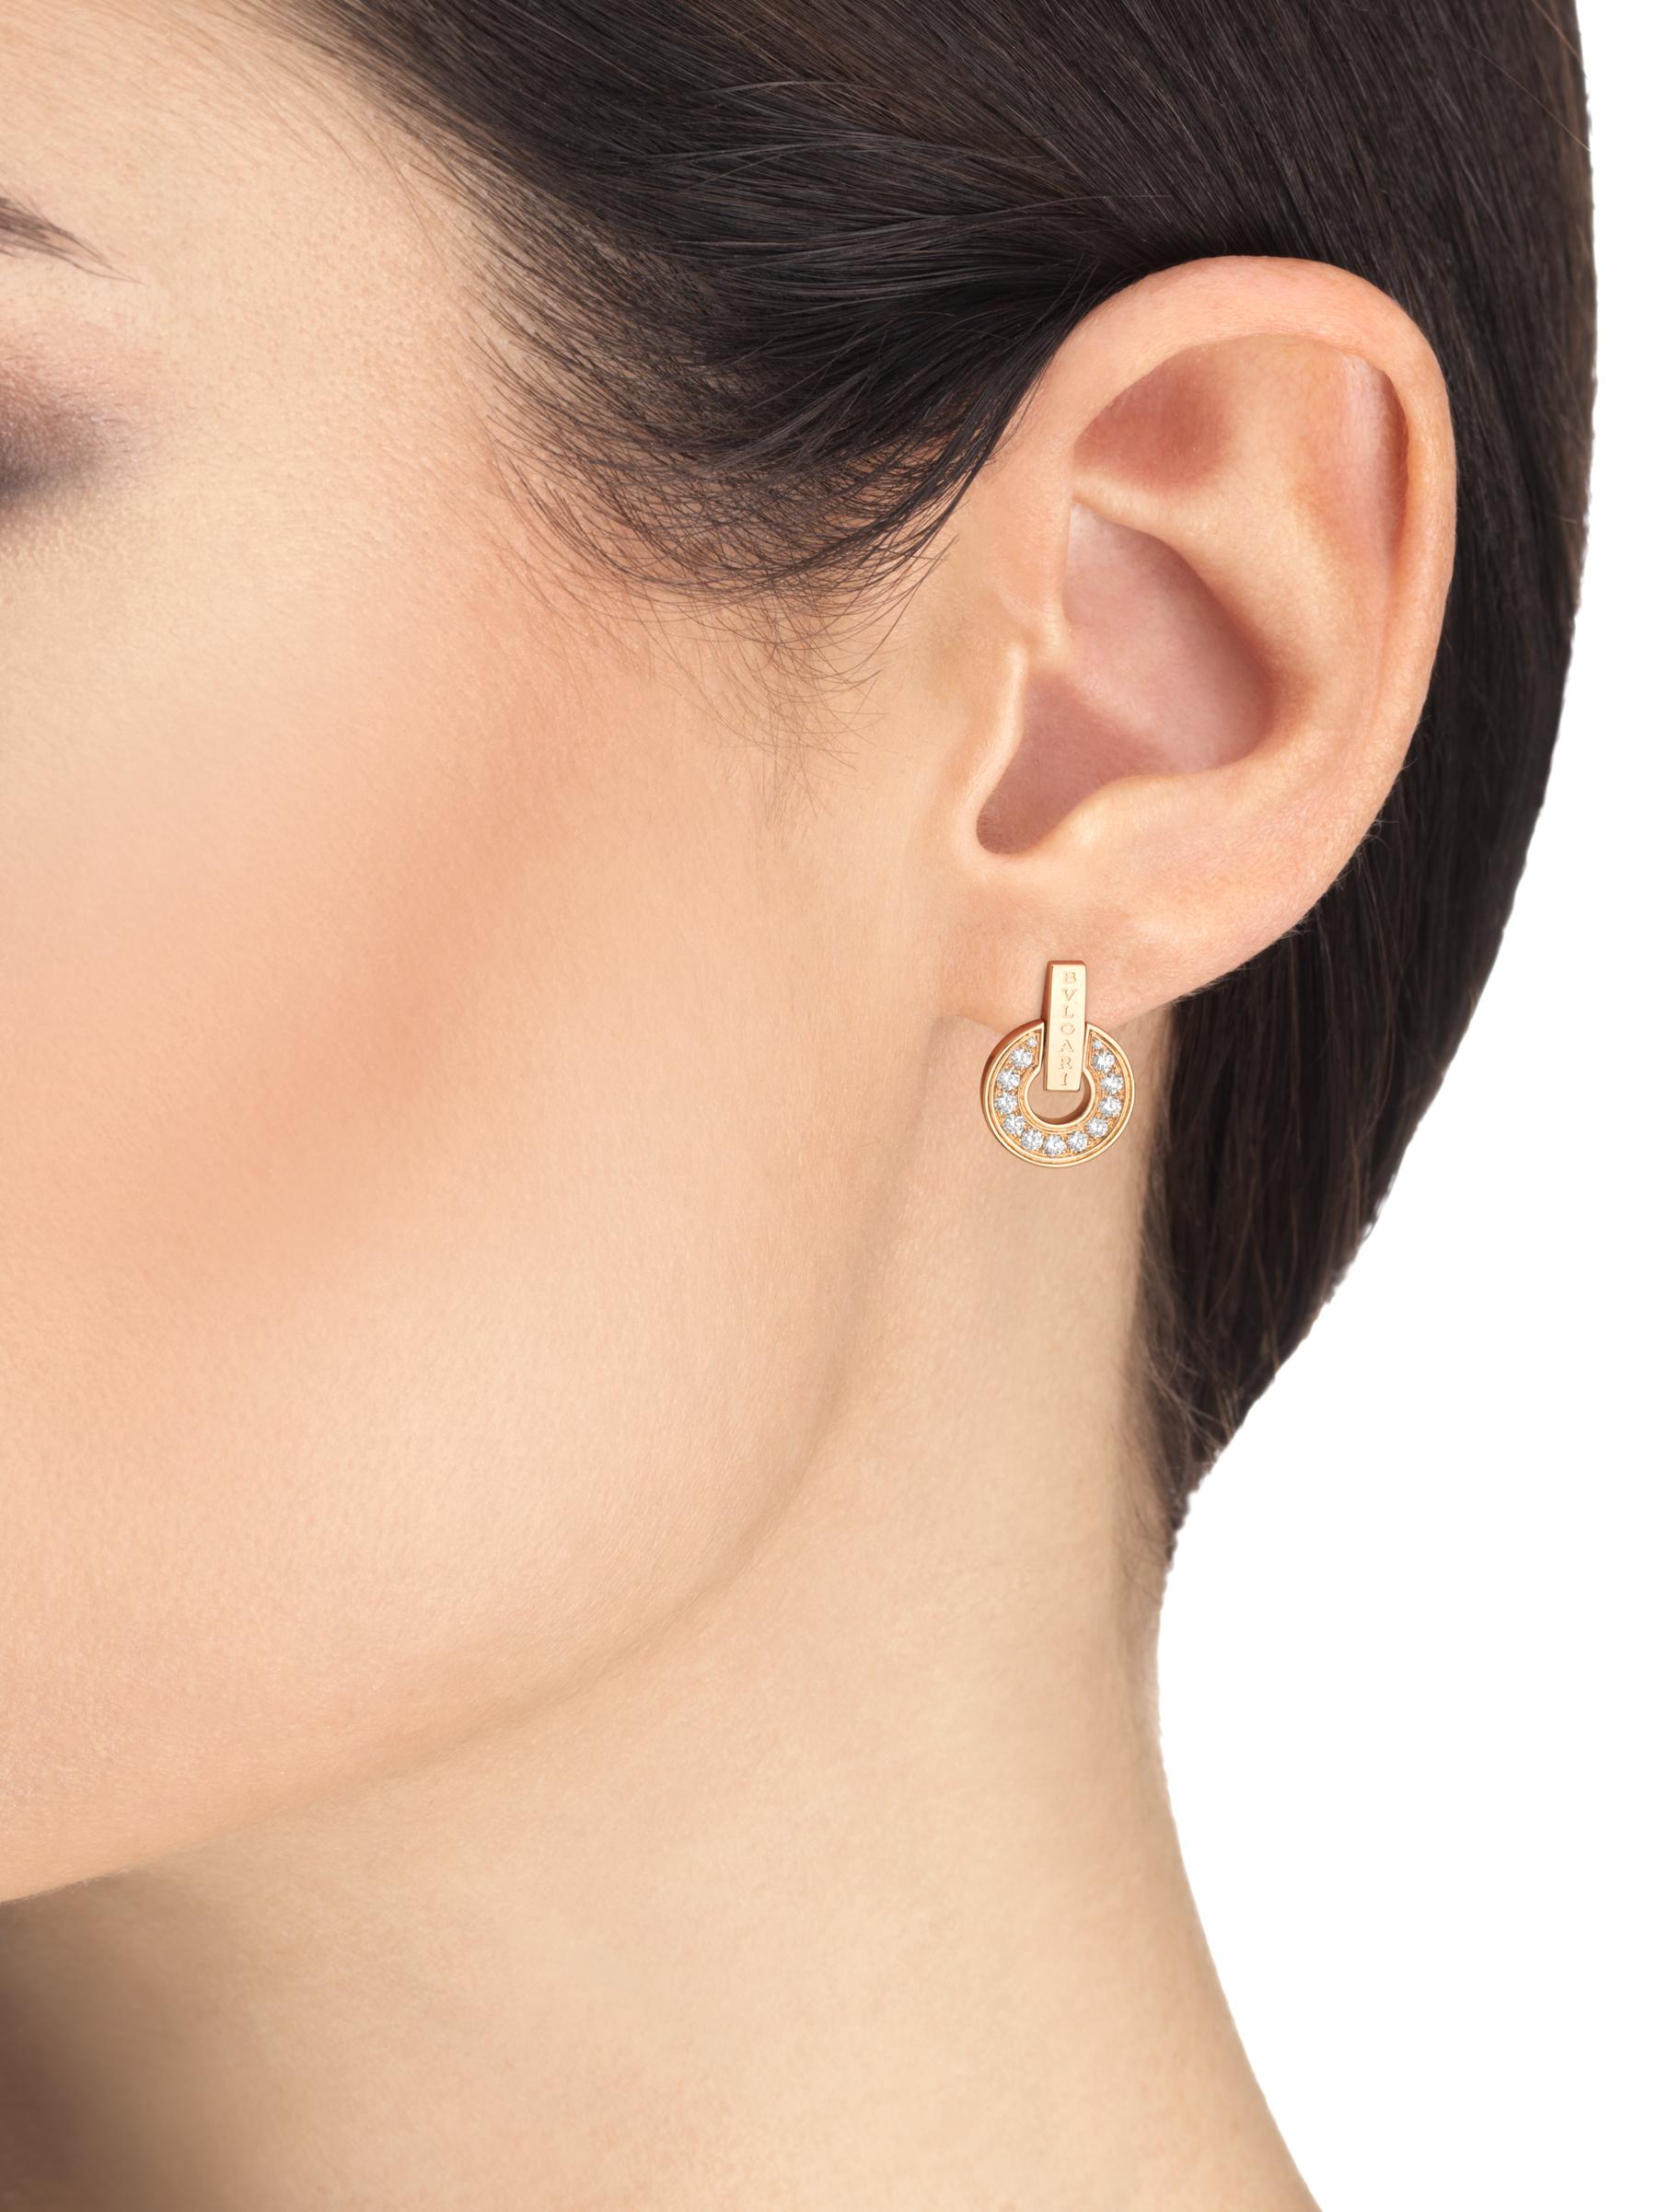 BVLGARI BVLGARI Openwork 18 kt rose gold earrings set with full pavé diamonds 357318 image 4